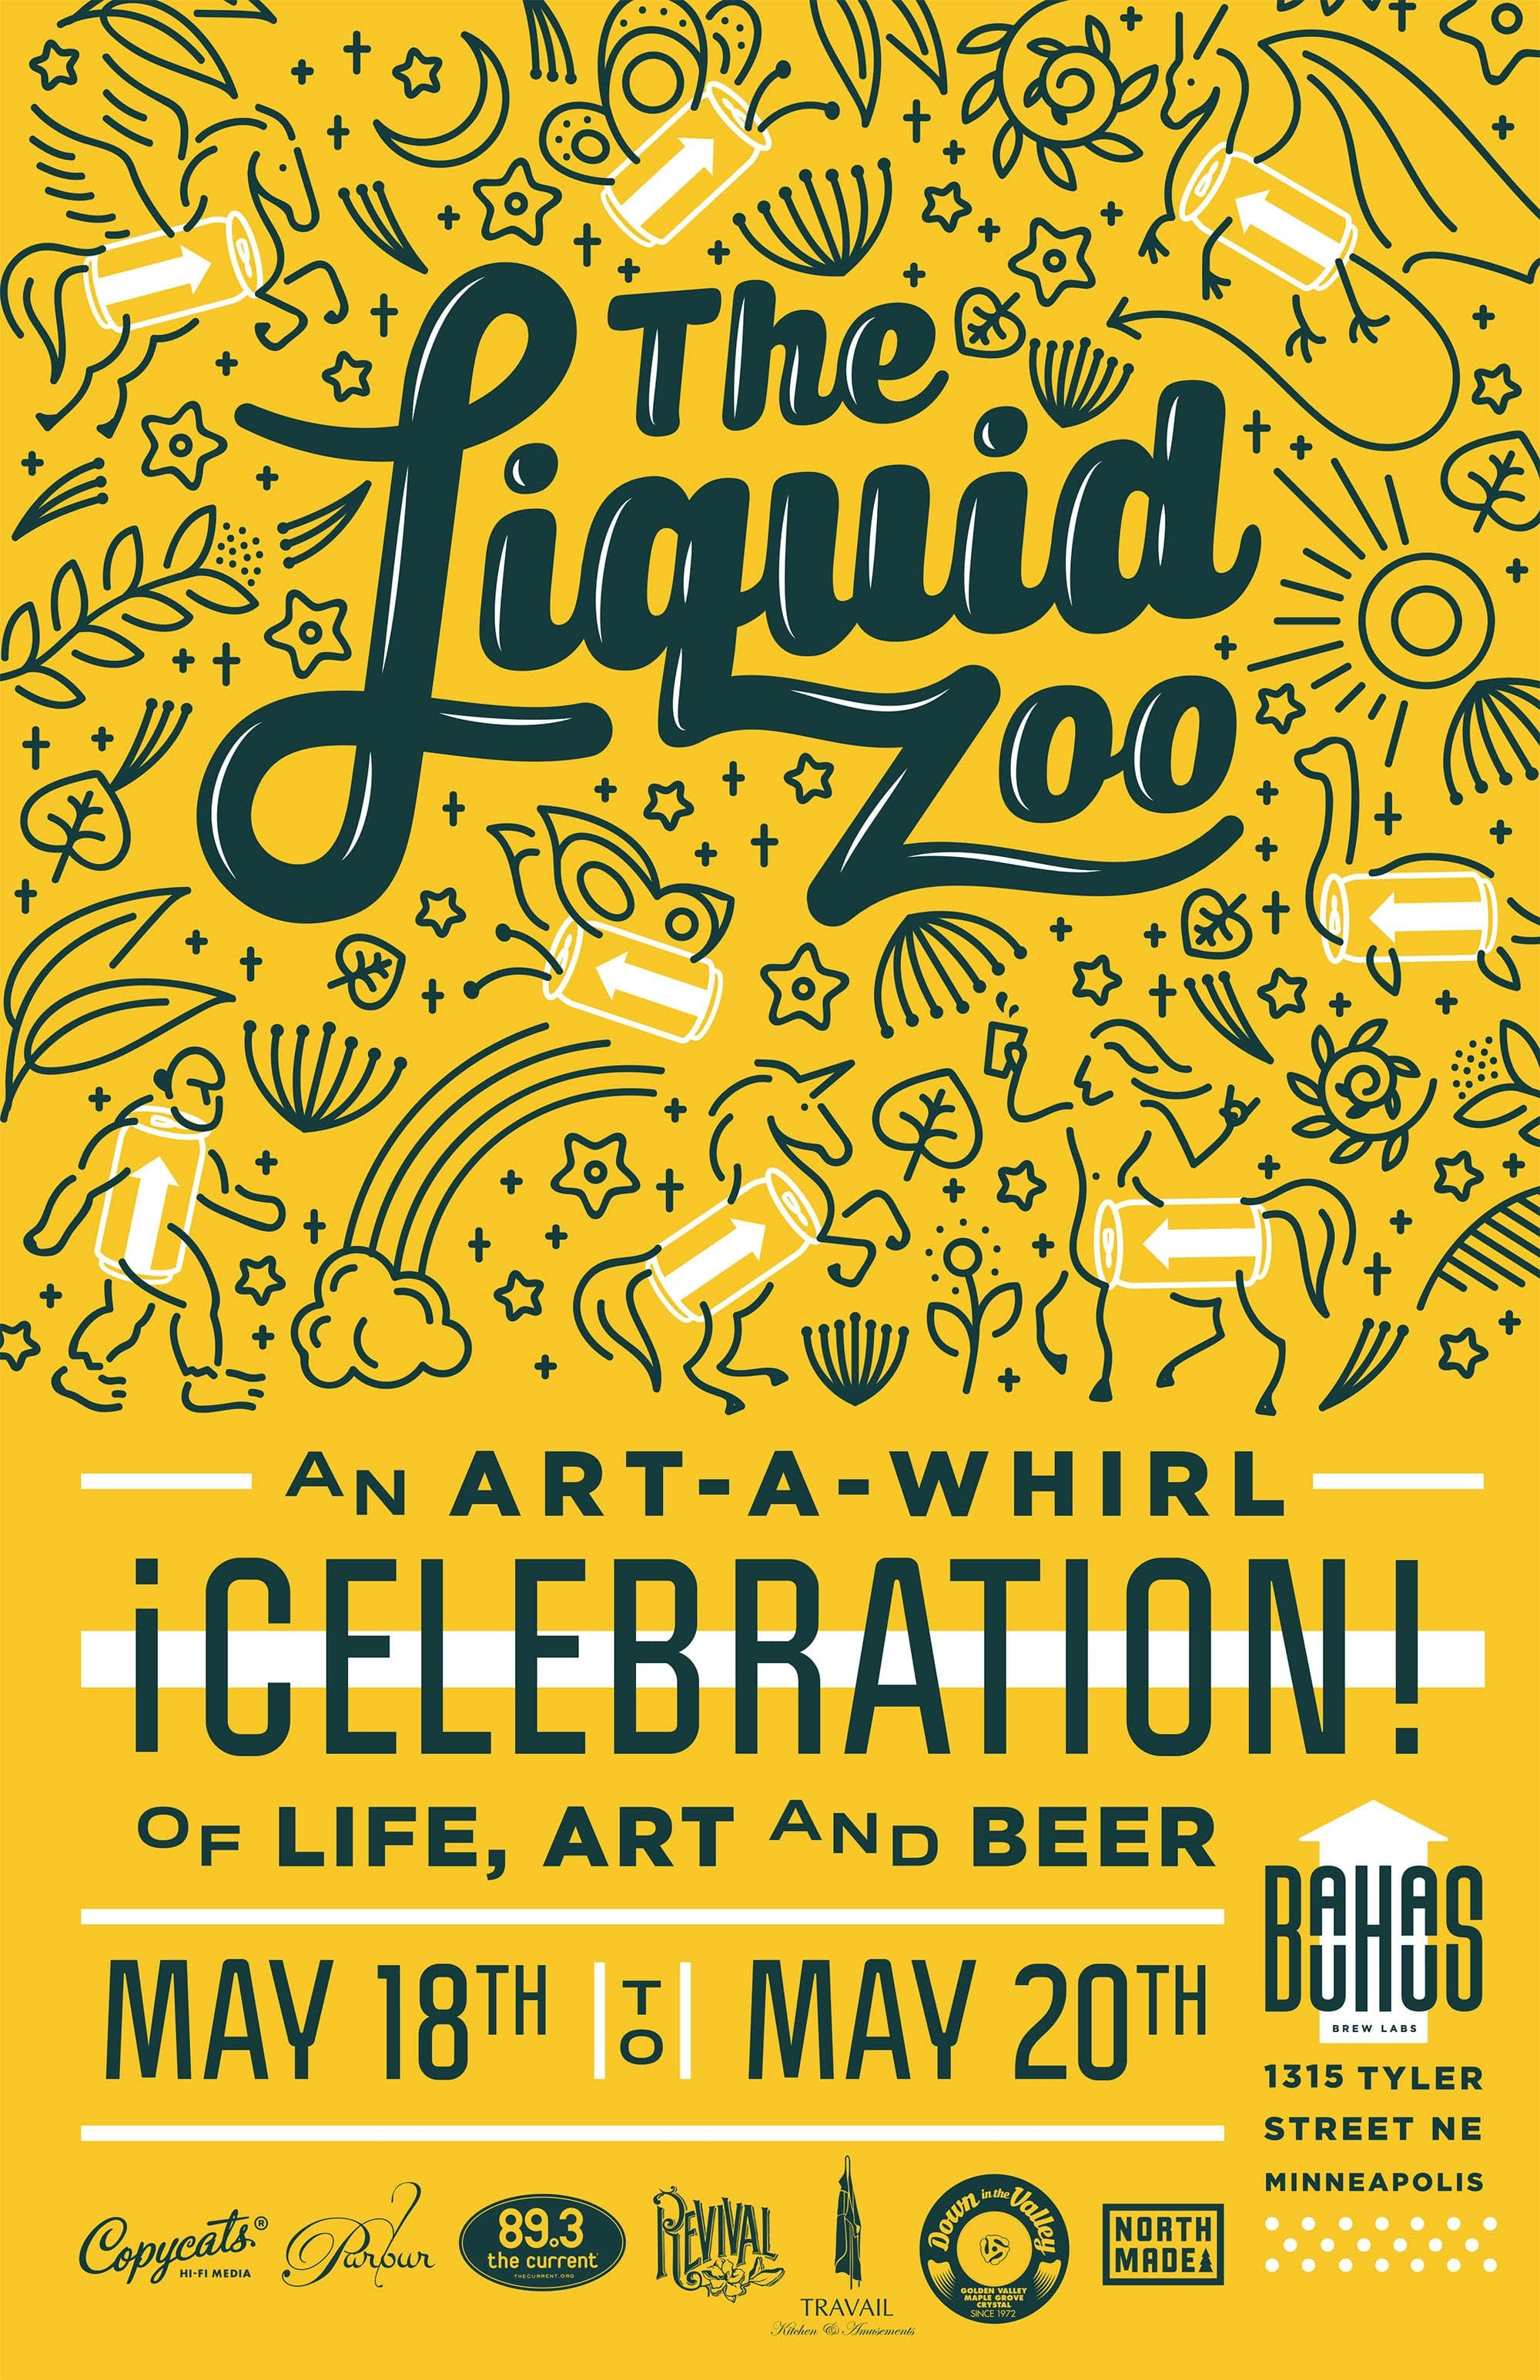 Bauhaus Liquid Zoo Art-a-Whirl Celebration